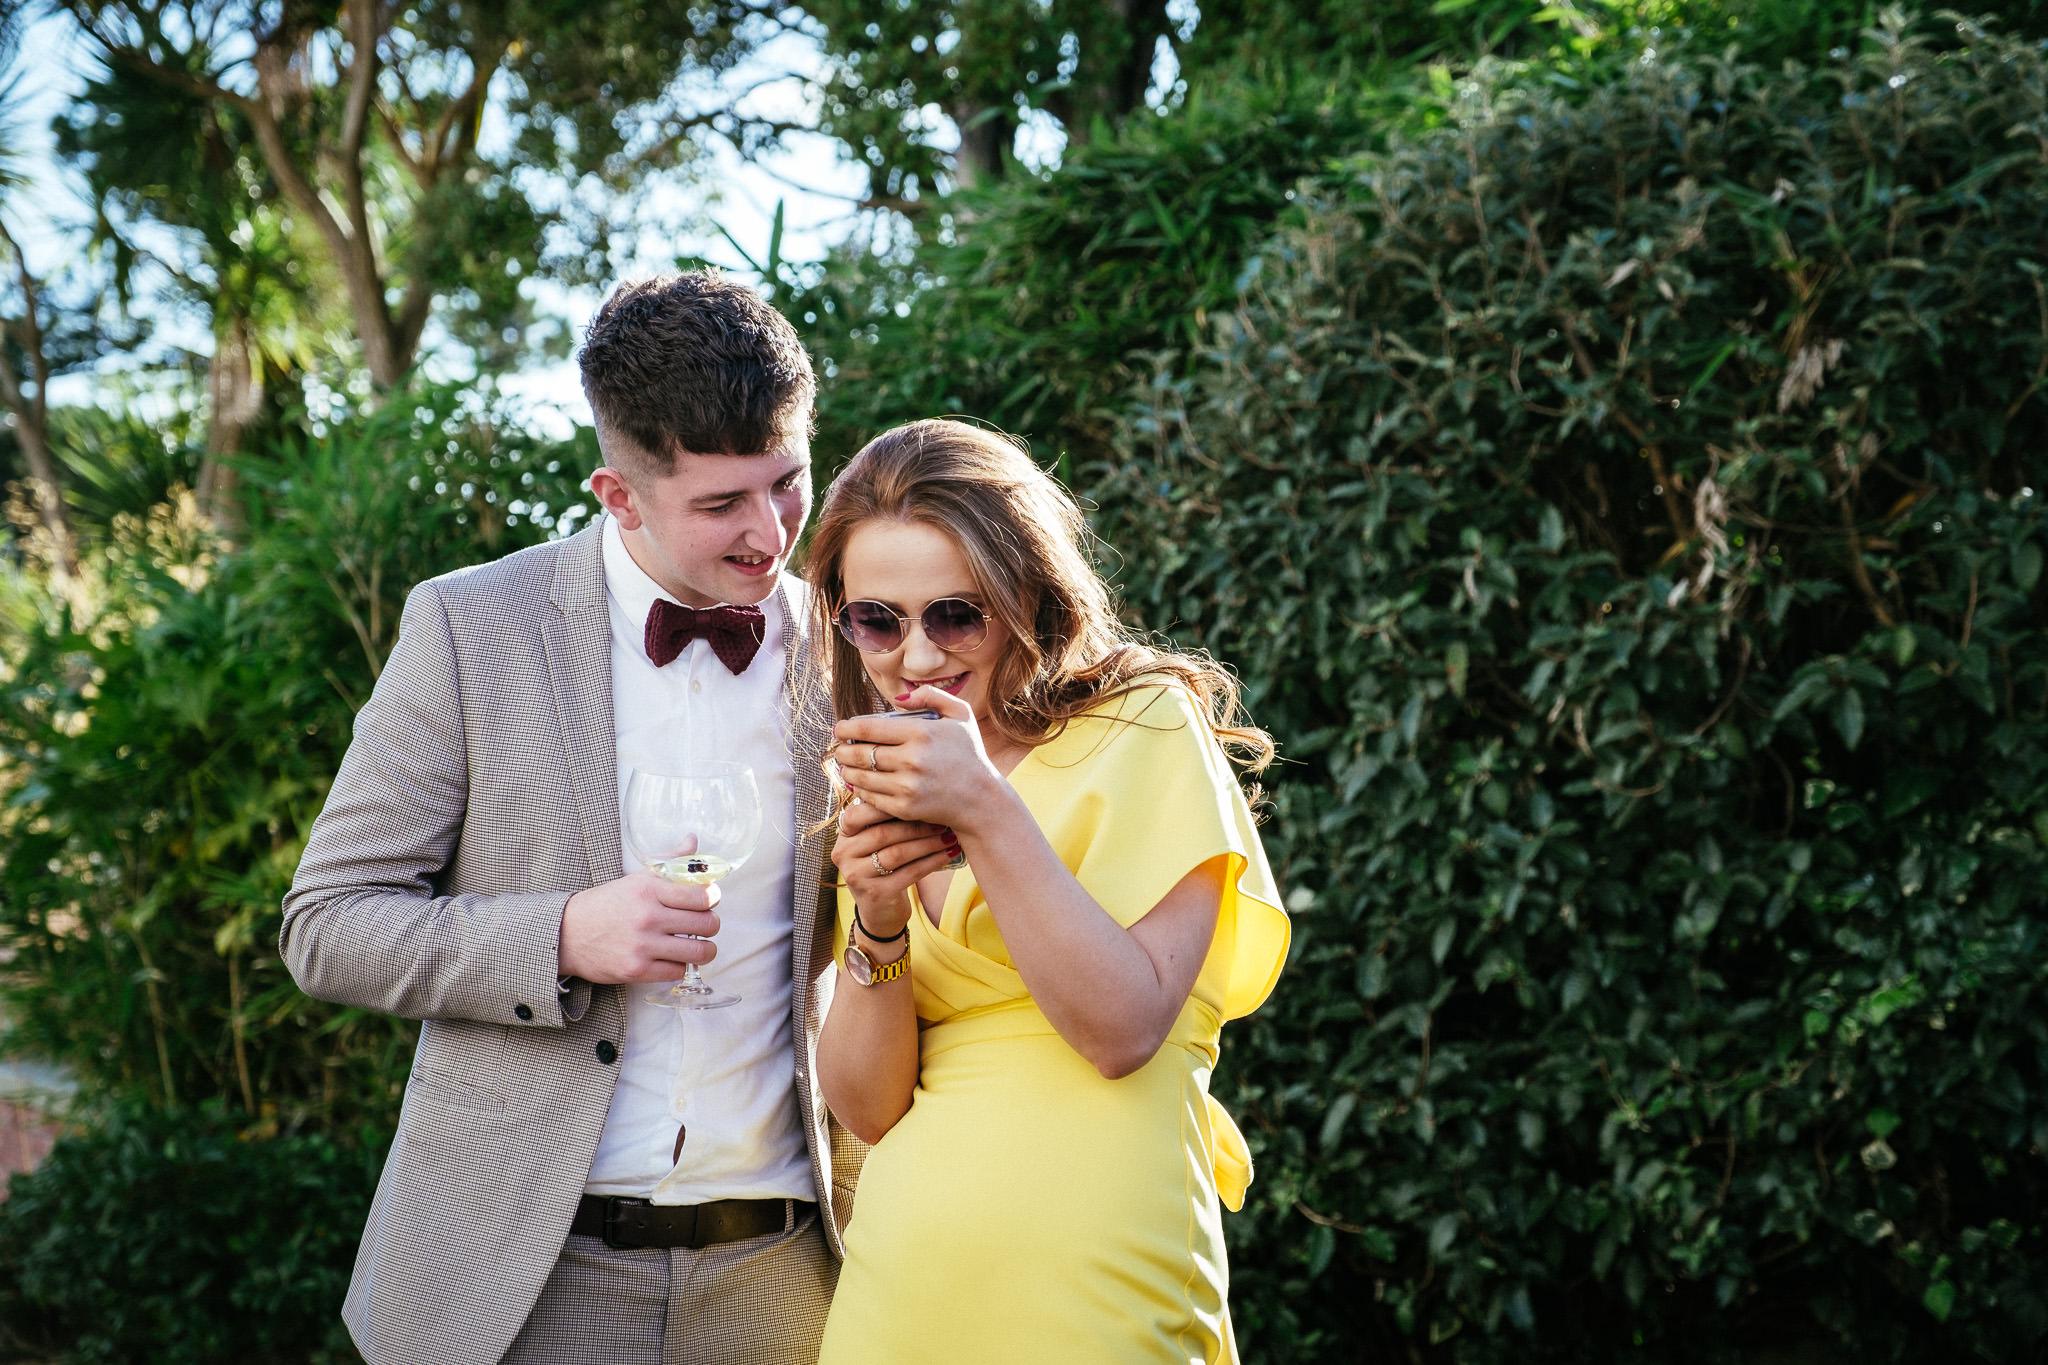 wedding guests looking at their phones